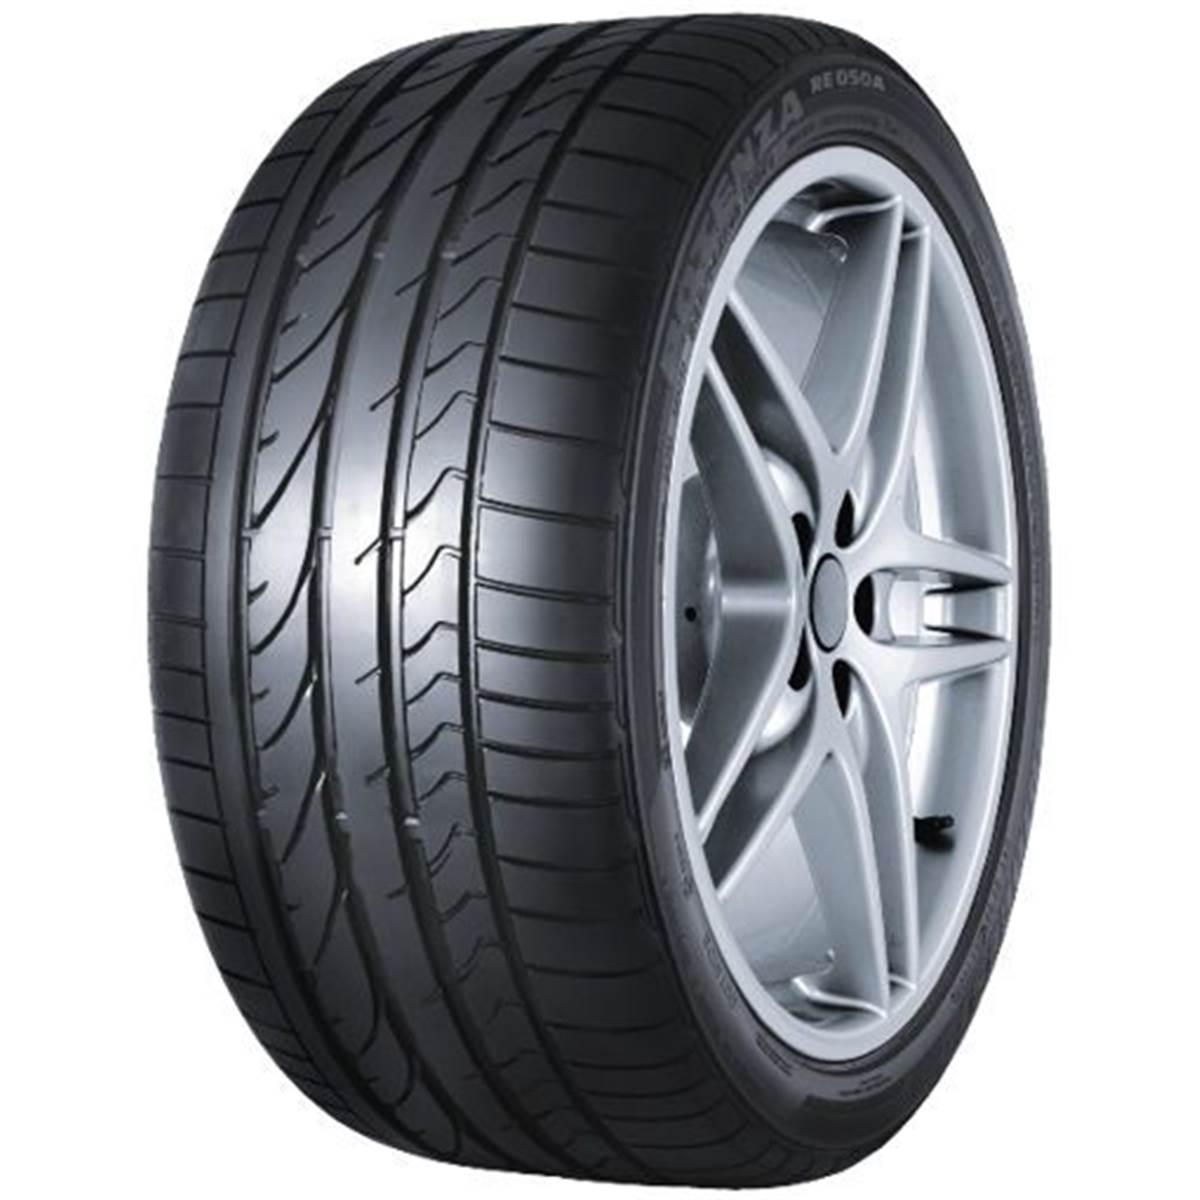 Pneu Bridgestone 205/45R17 84W Potenza Re050A